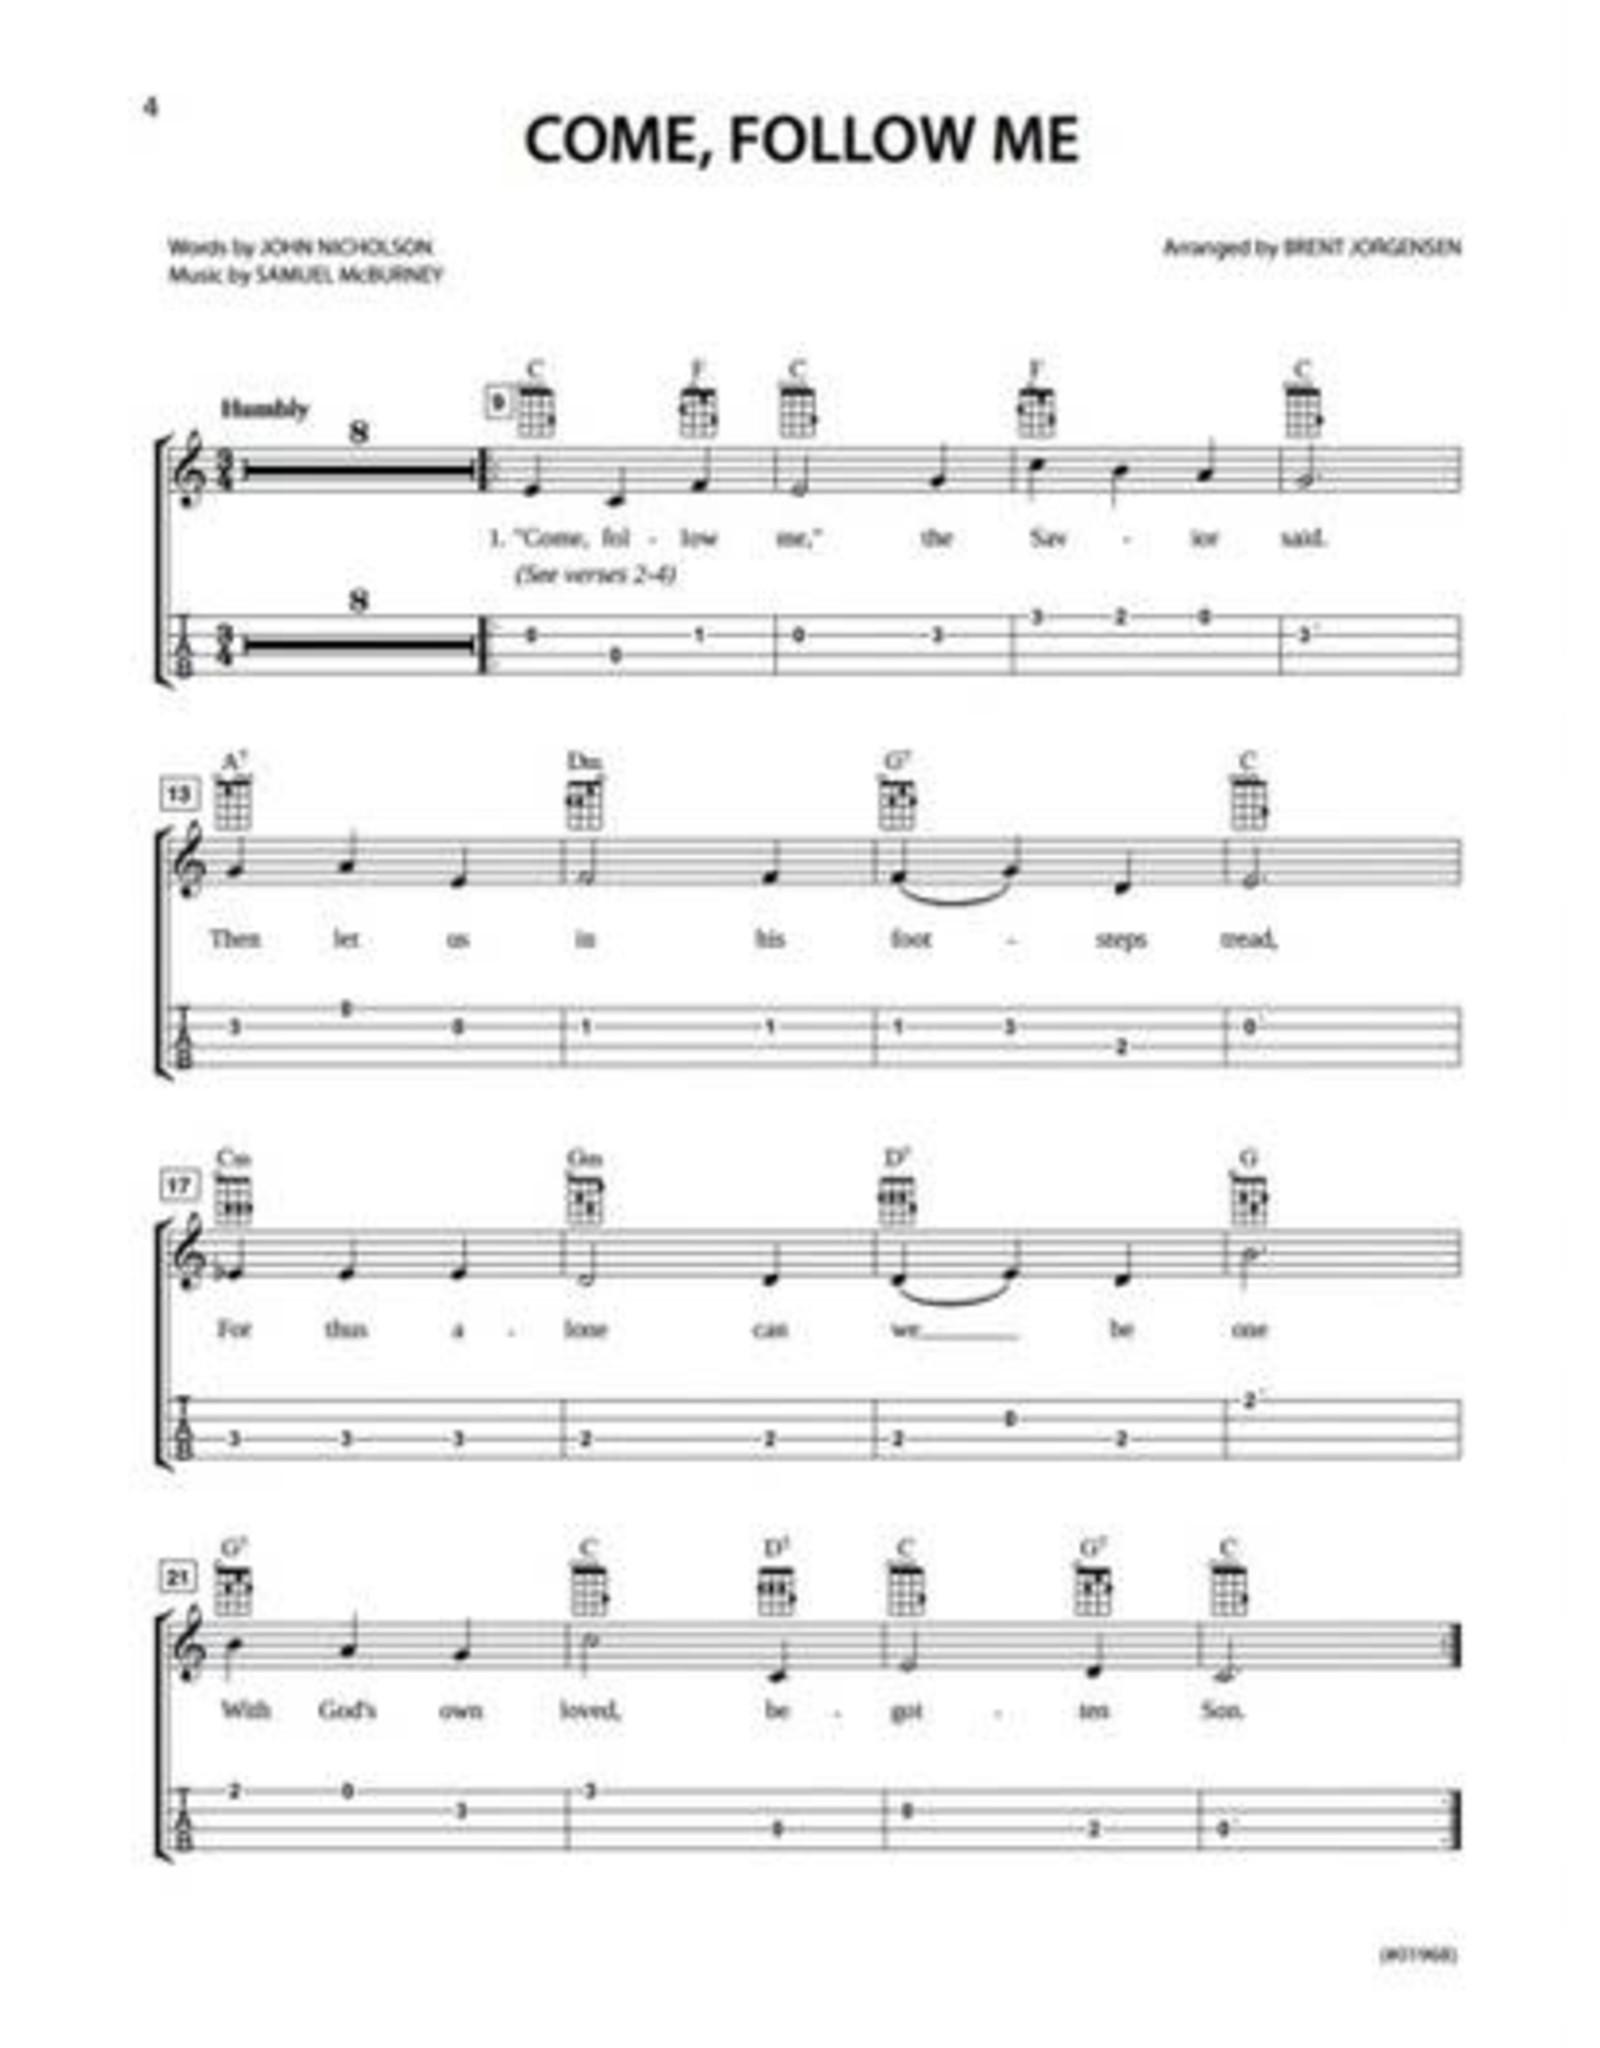 Jackman Music Hymn-Alongs Vol. 1 - arr. Brent Jorgensen - Ukulele